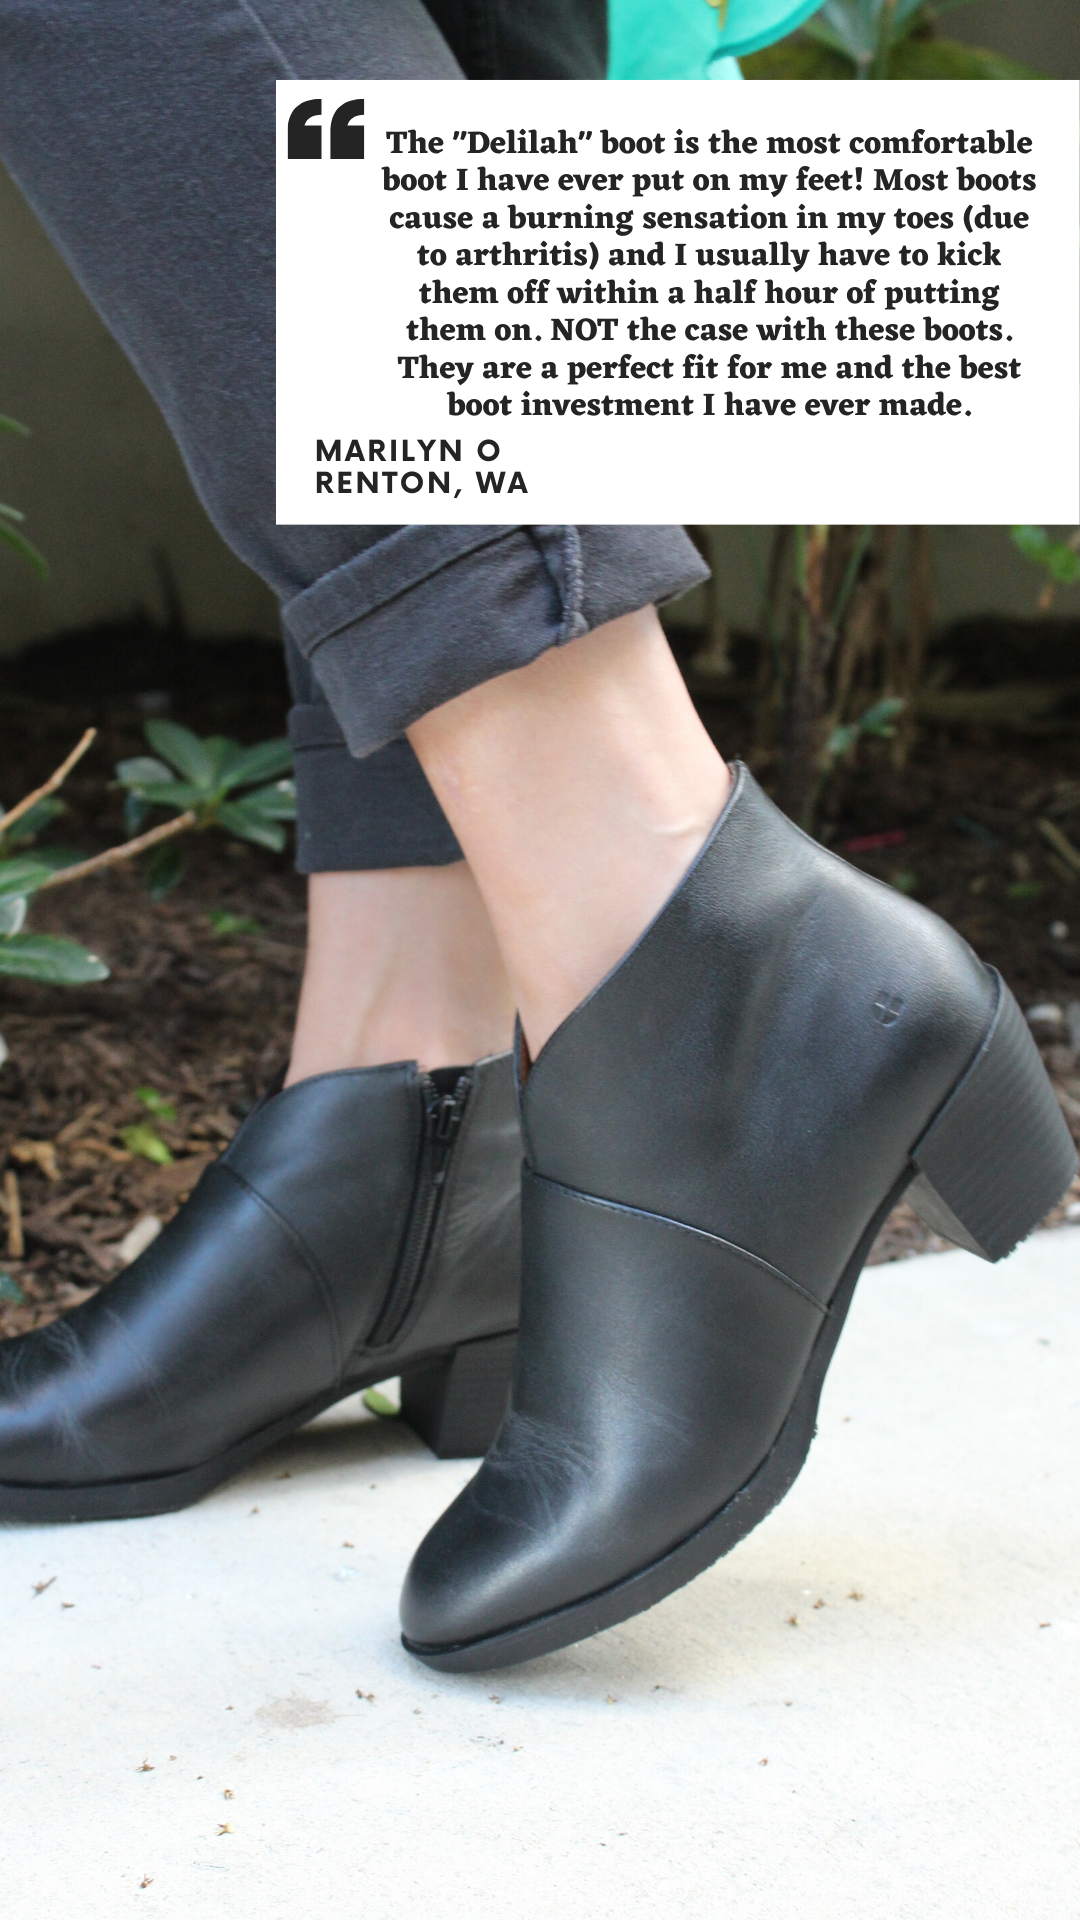 Delilah Black Women S Work Shoes Comfortable Boots Ladies Slips [ 1920 x 1080 Pixel ]